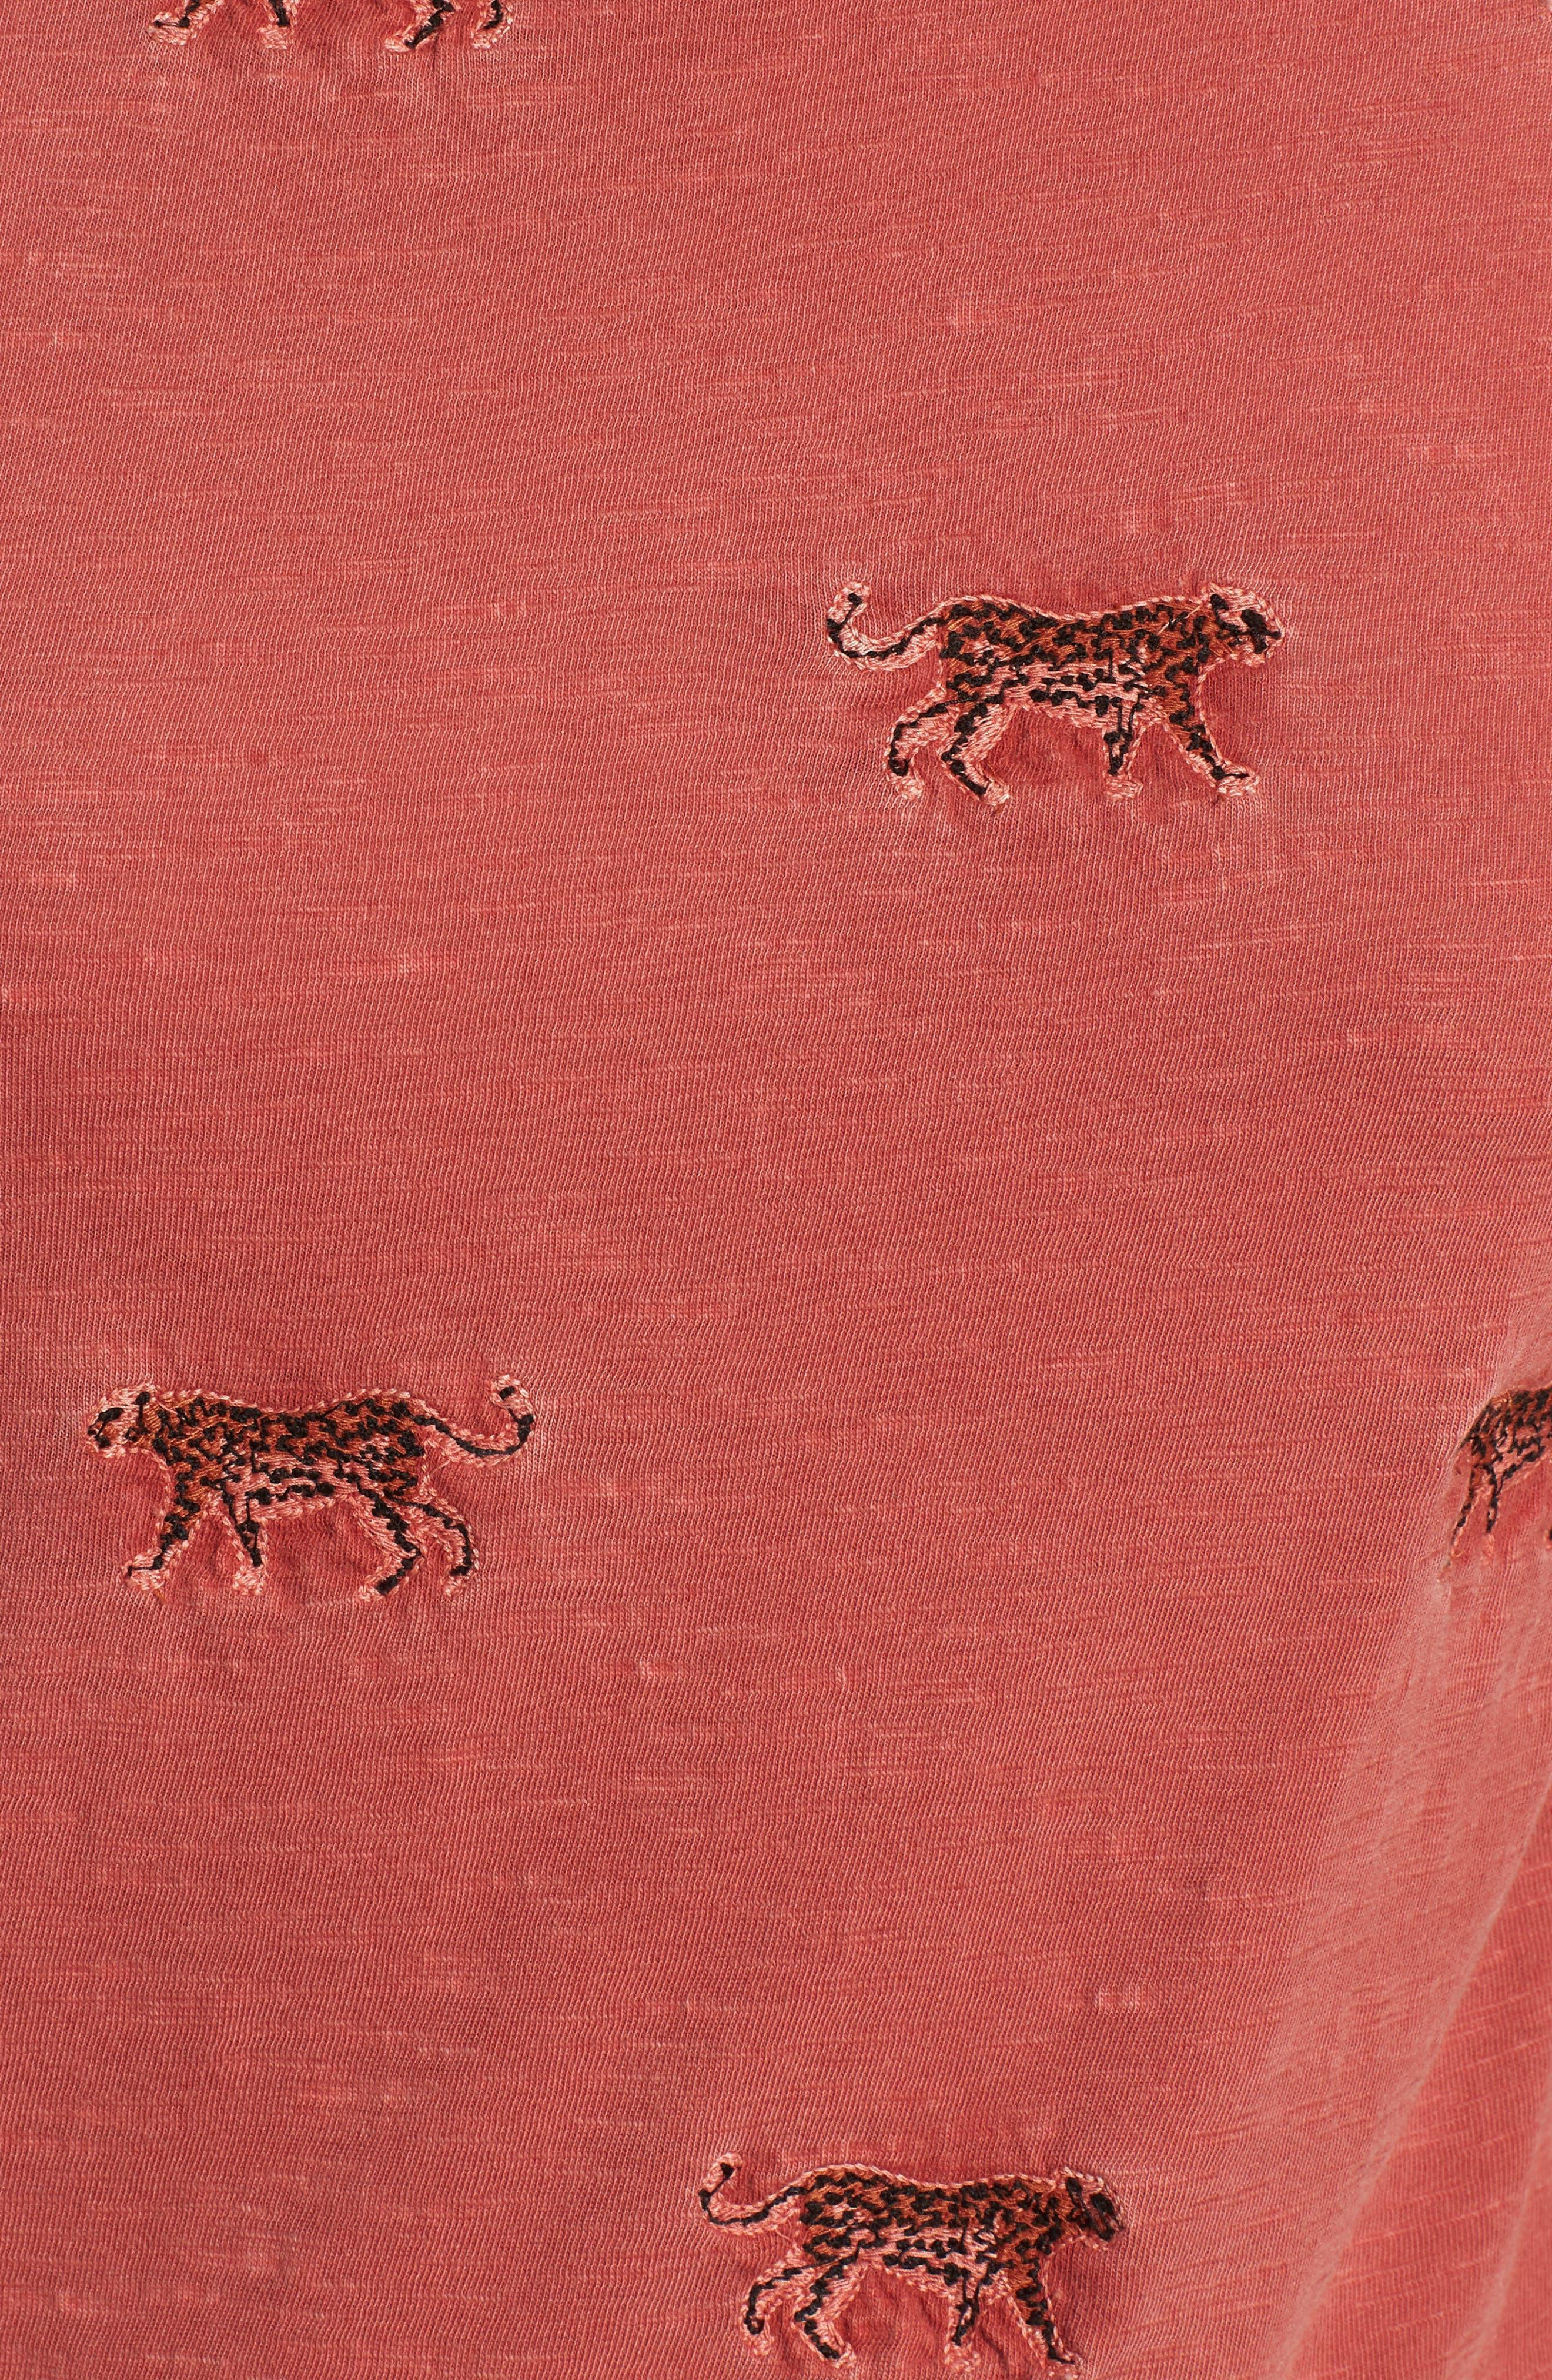 Cheetah Tee,                             Alternate thumbnail 5, color,                             640